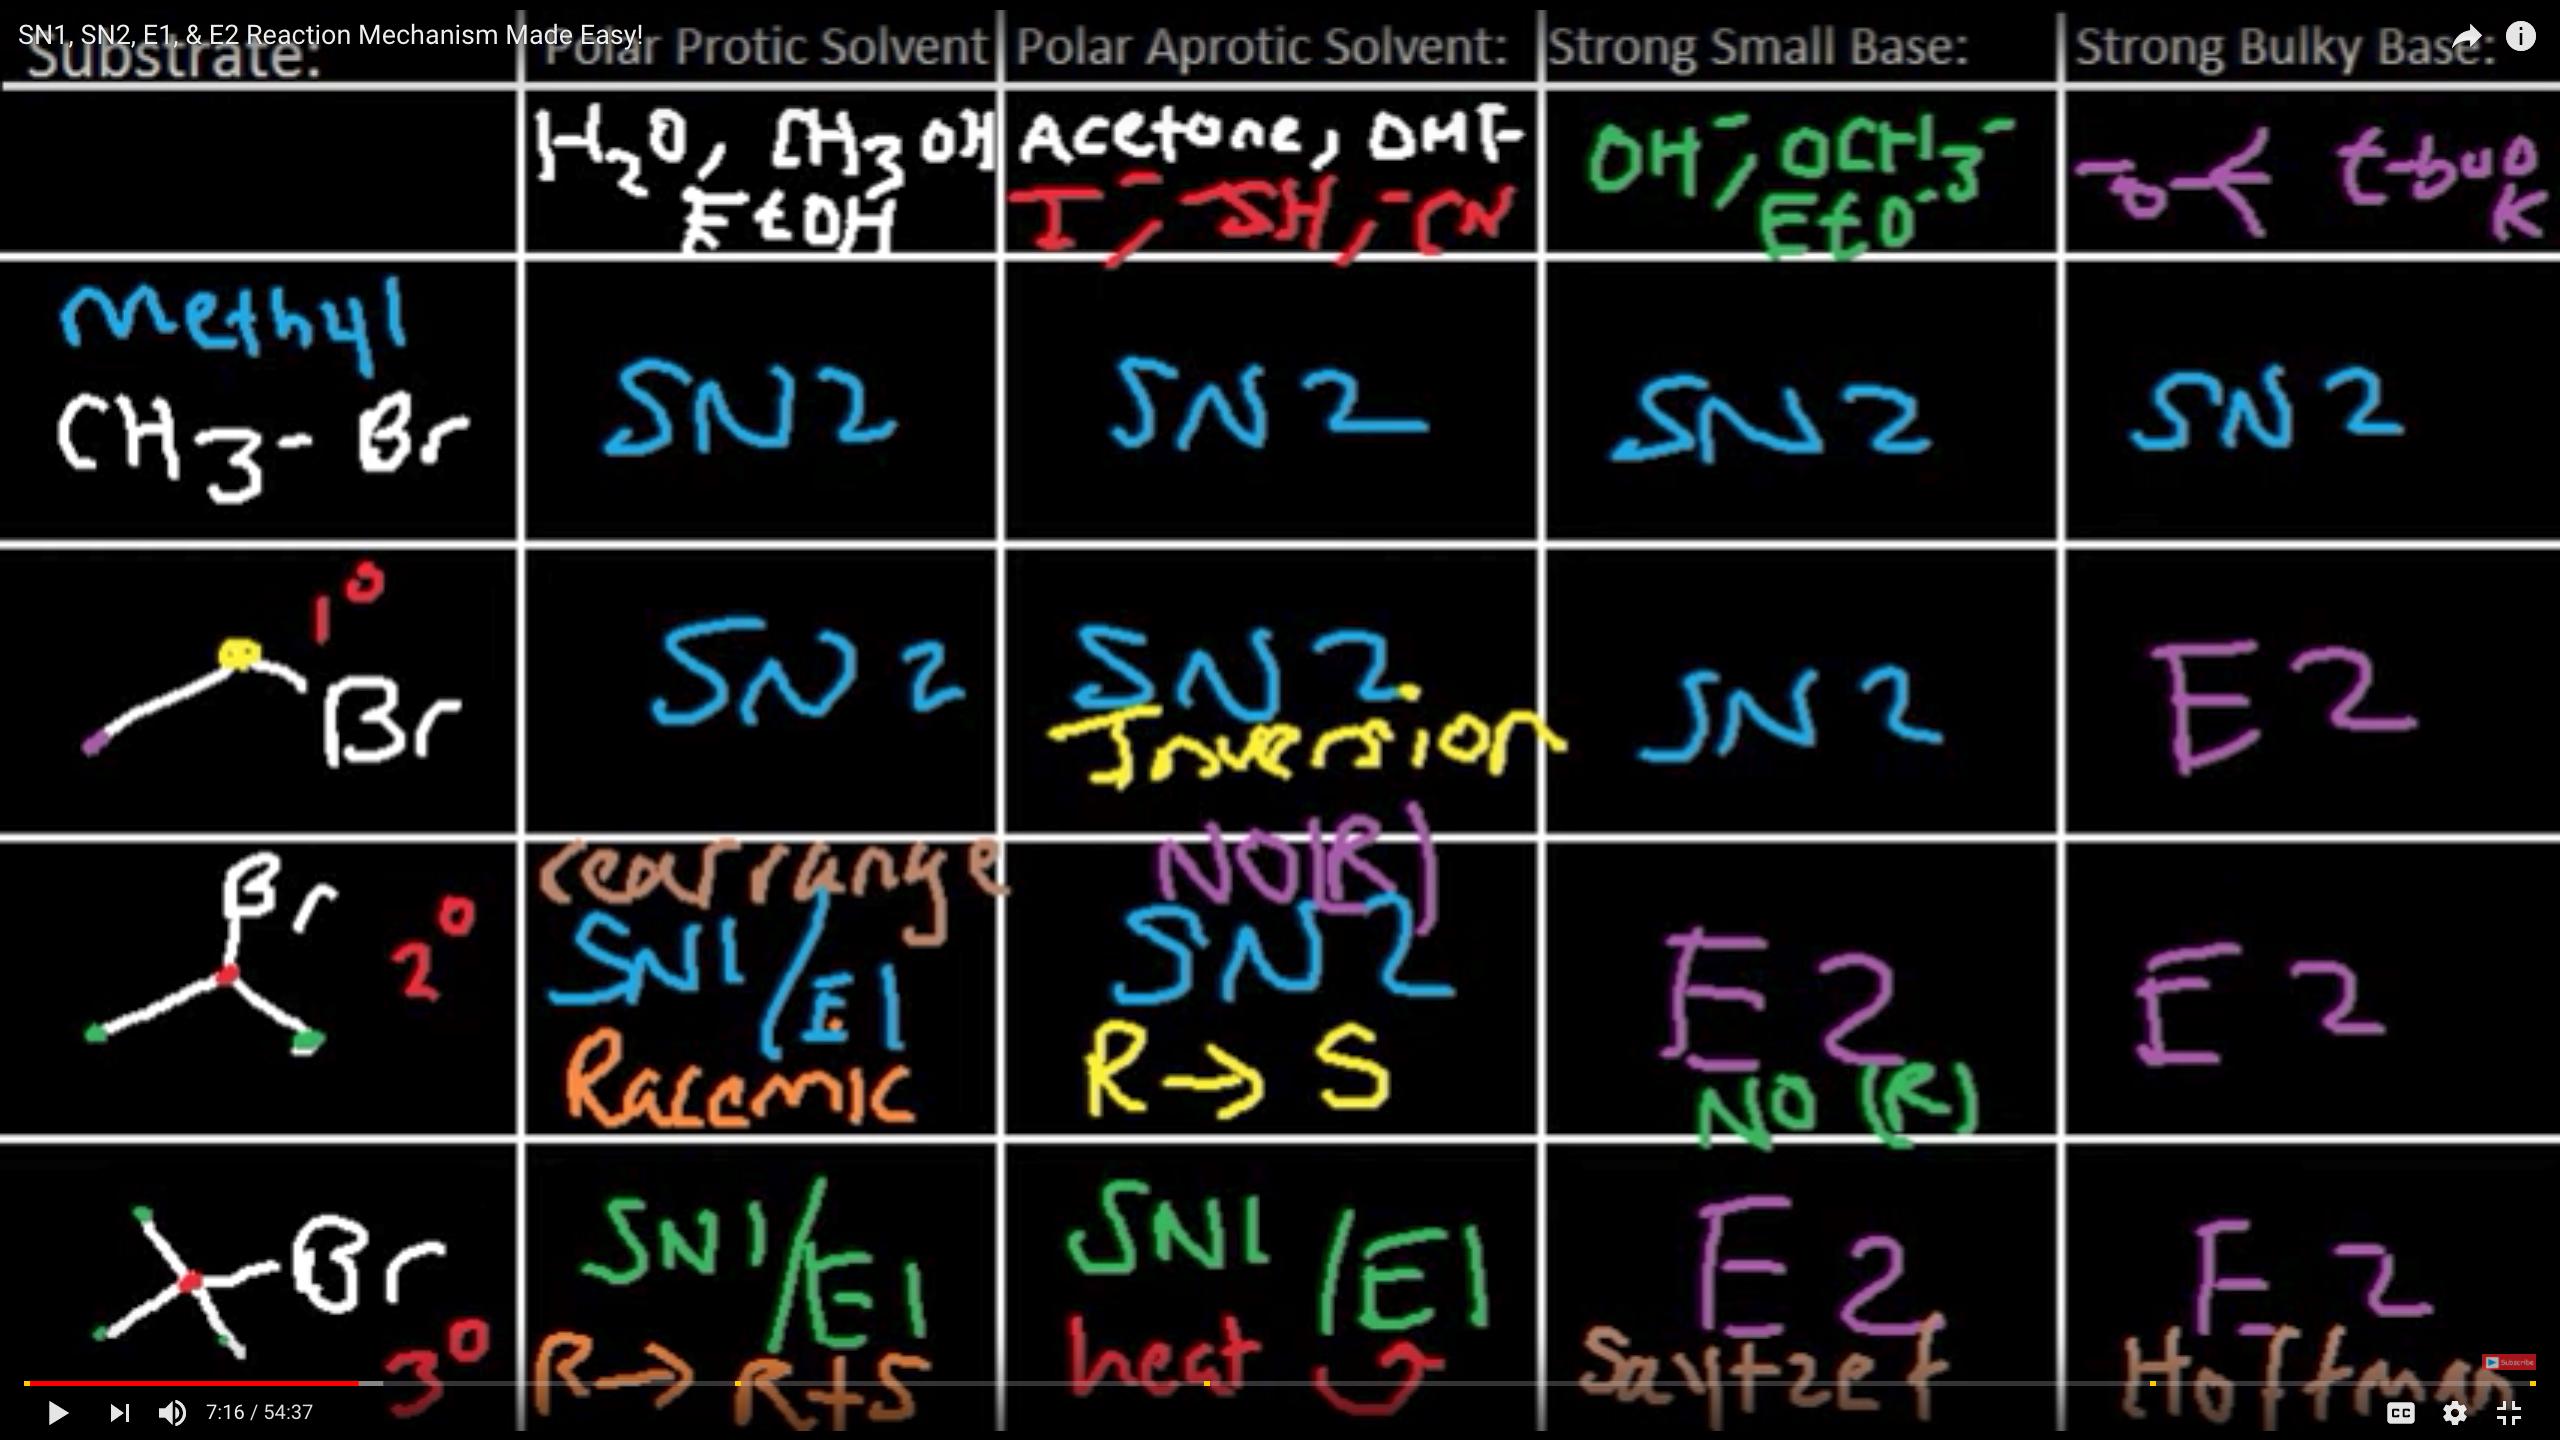 Sn1 Sn2 E1 E2 | Because Science | Organic chemistry